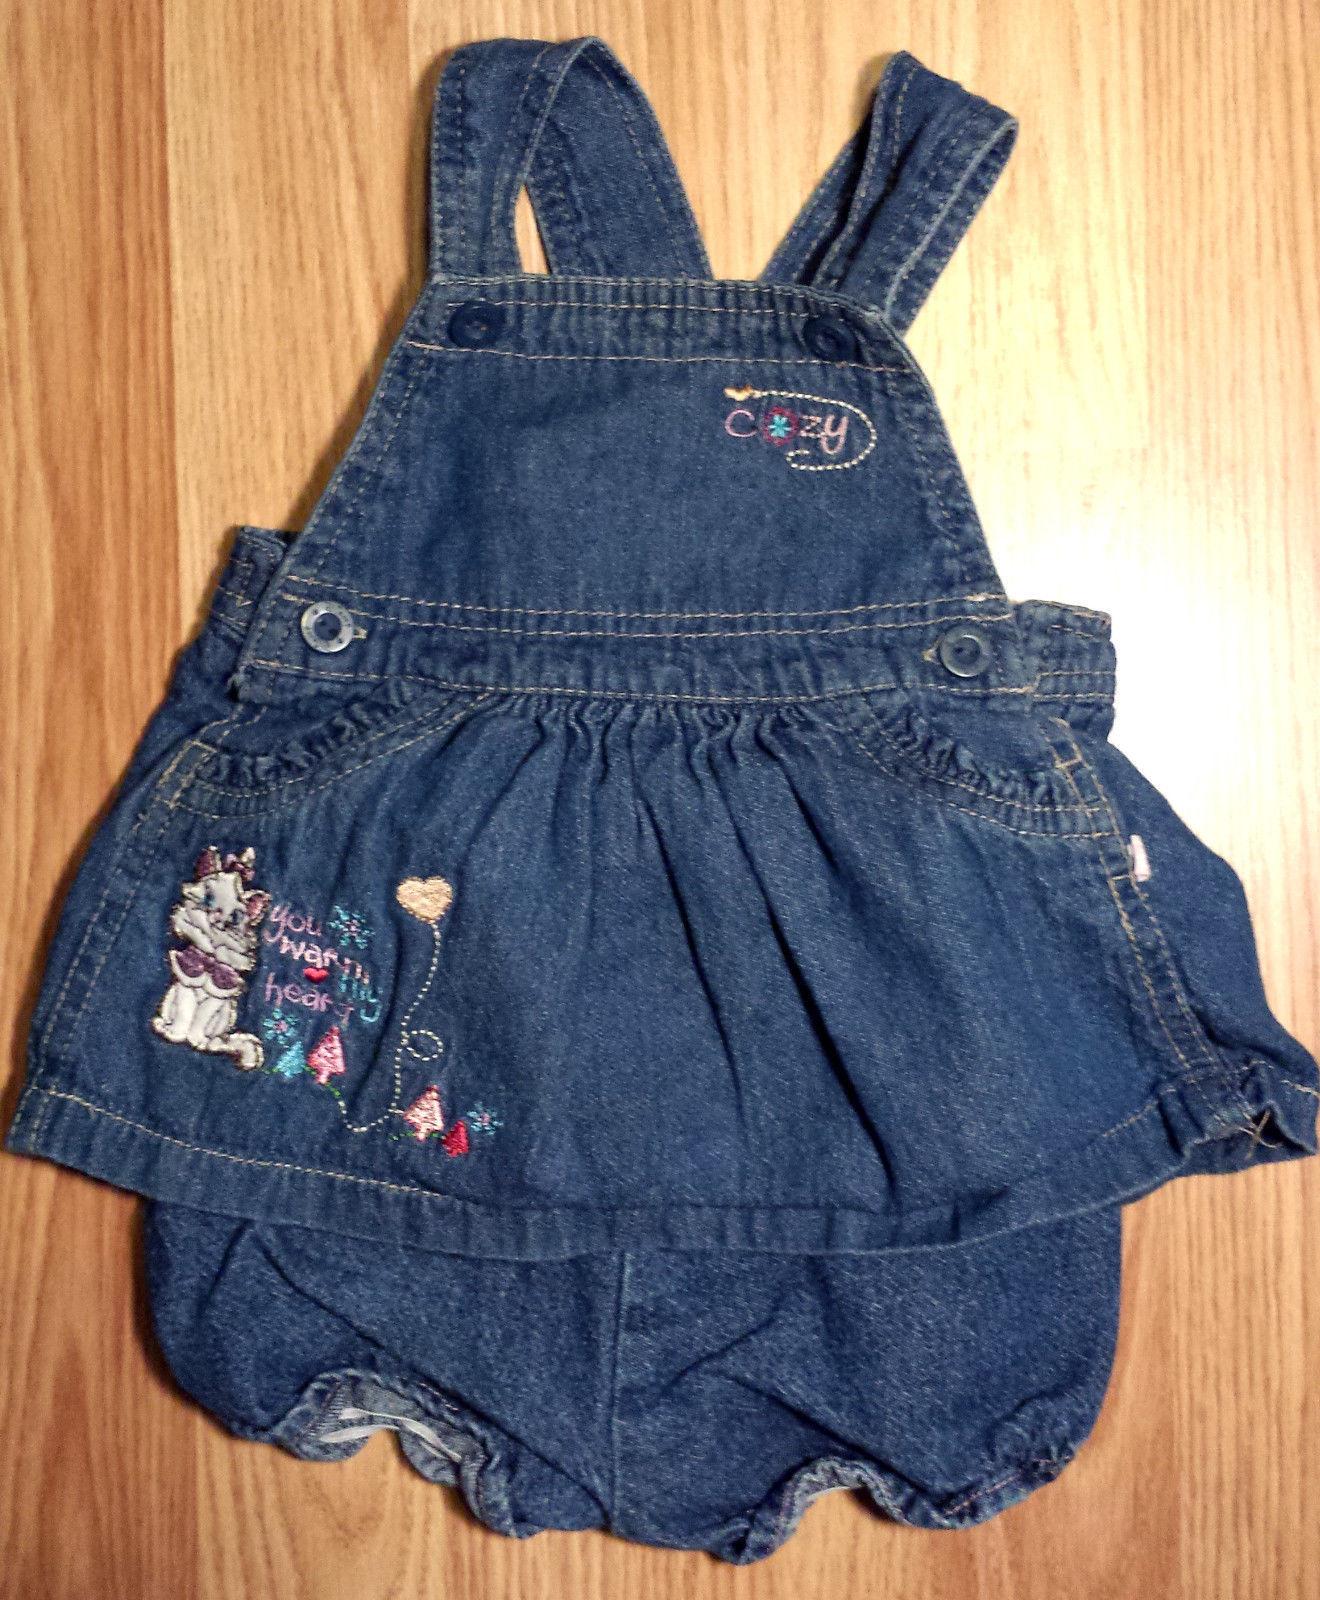 Girl's Size 3-6 M Months Two Piece Blue Denim Aristocats Dress & DC Set Disney